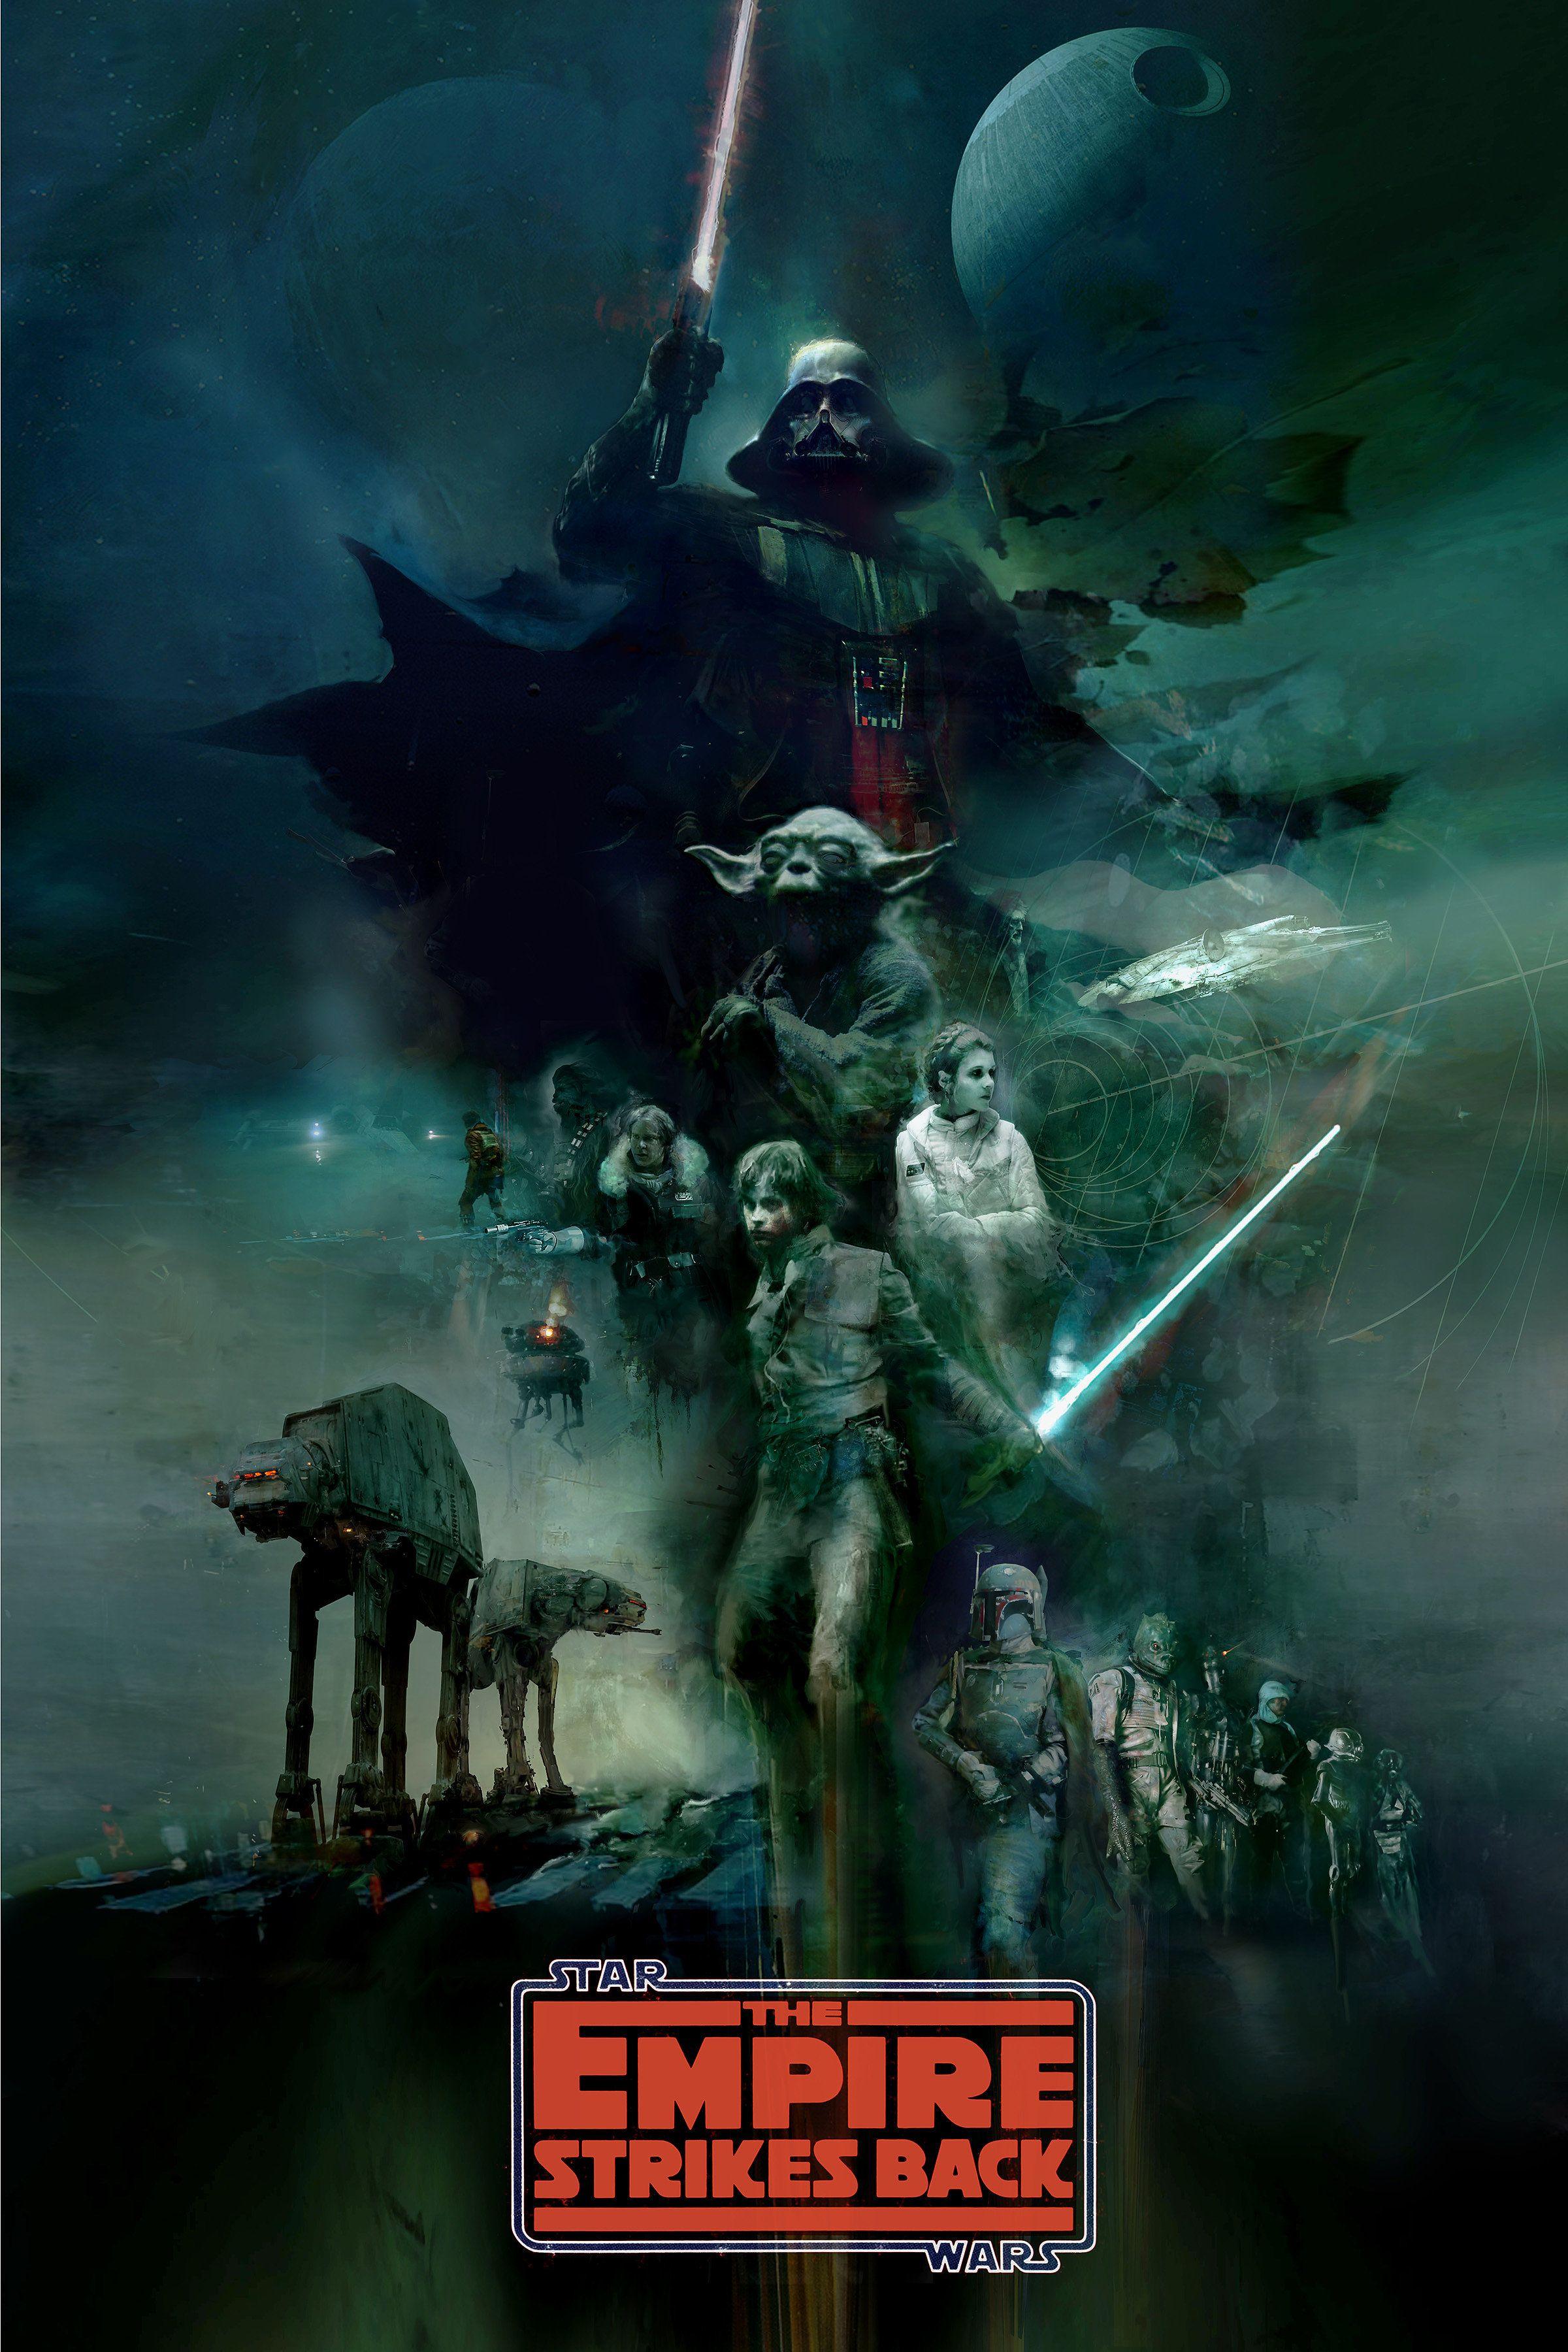 Empire christopher shy star wars poster star wars